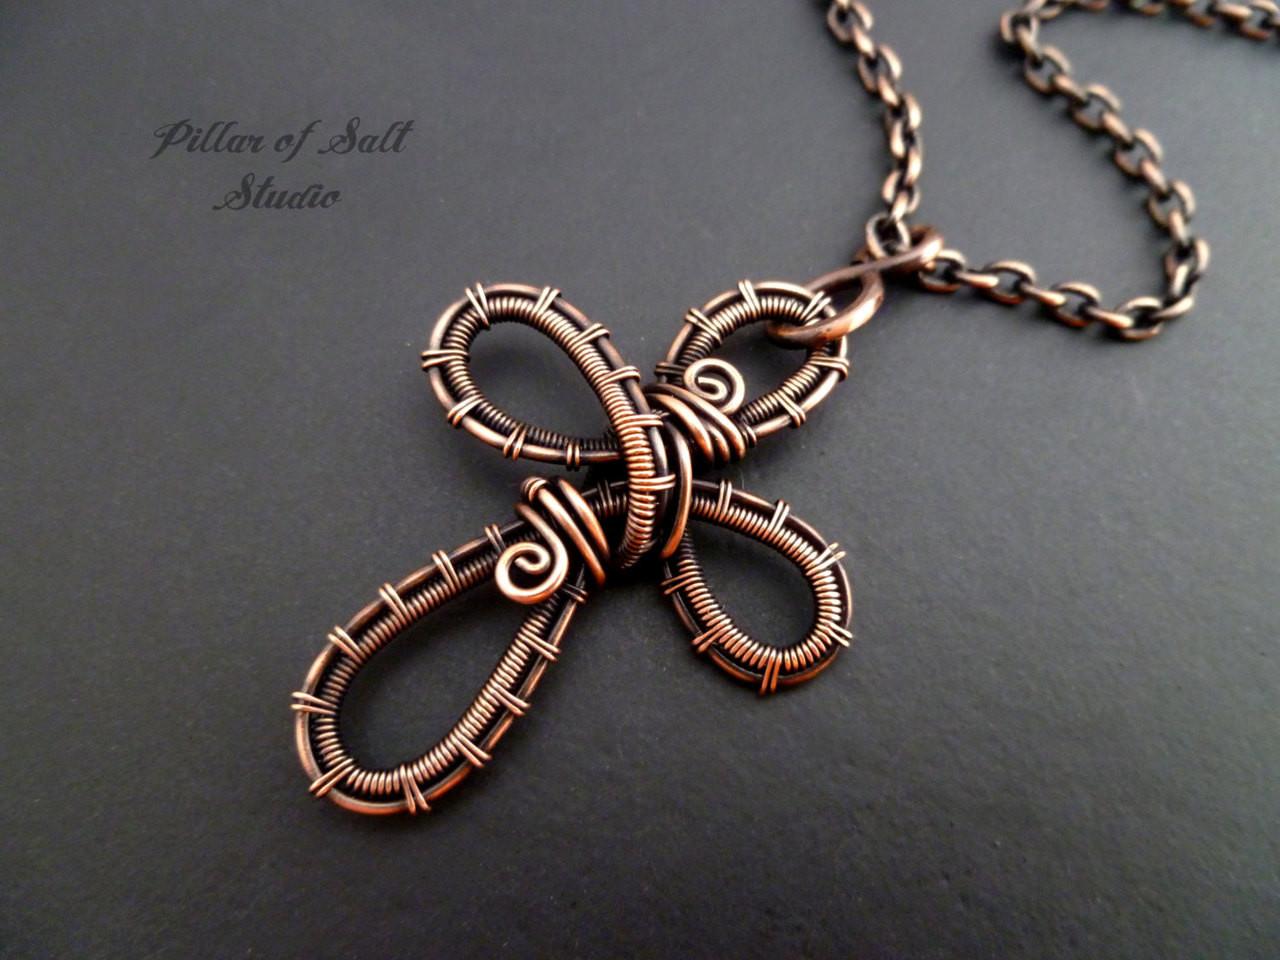 Copper woven wire cross pendant necklace wire wrapped jewelry by woven wire cross pendant necklace copper wire wrapped jewelry by pillar of salt studio aloadofball Choice Image